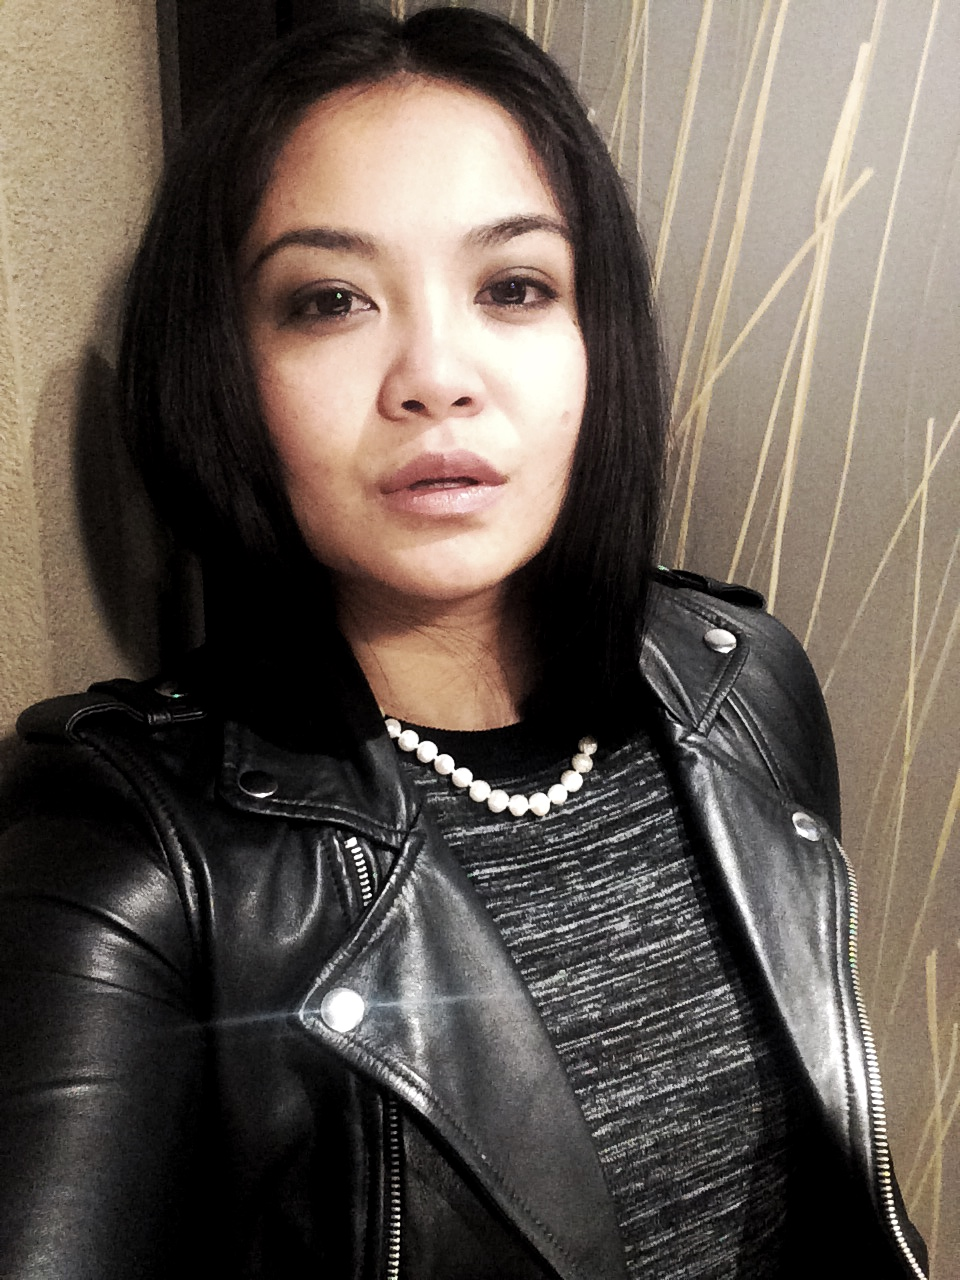 #StyleByGlor: Maje Basalt Leather, Sz 36 | Get Plenty, Monk & Lou Dress, XS | Heirloom Pearl necklace